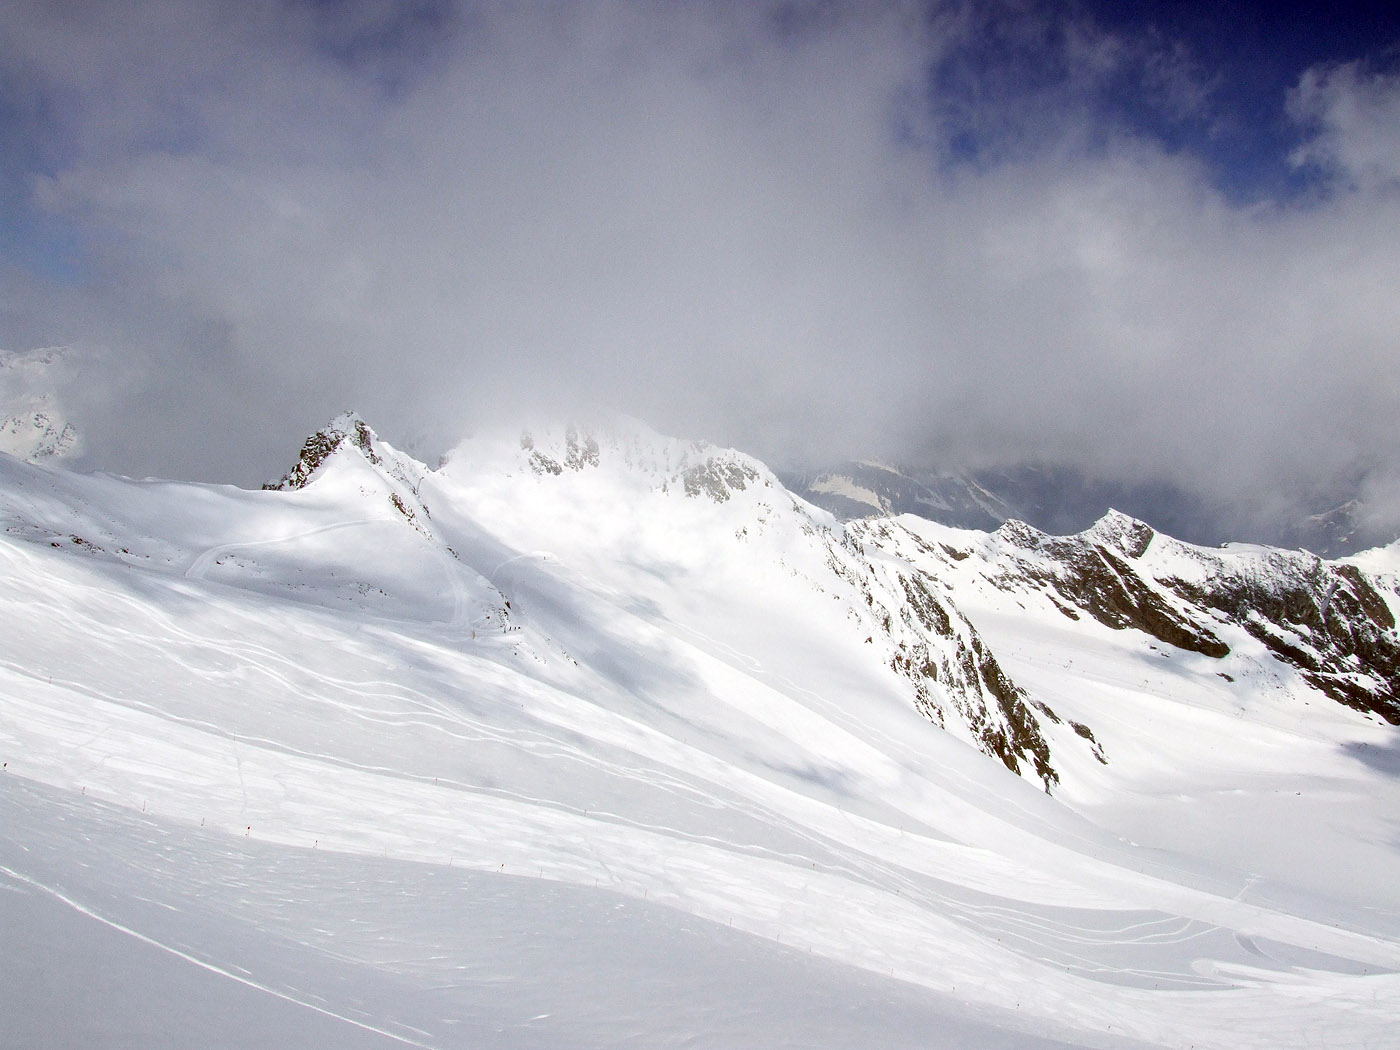 winter 108 hintergrundbild gratis - photo #39